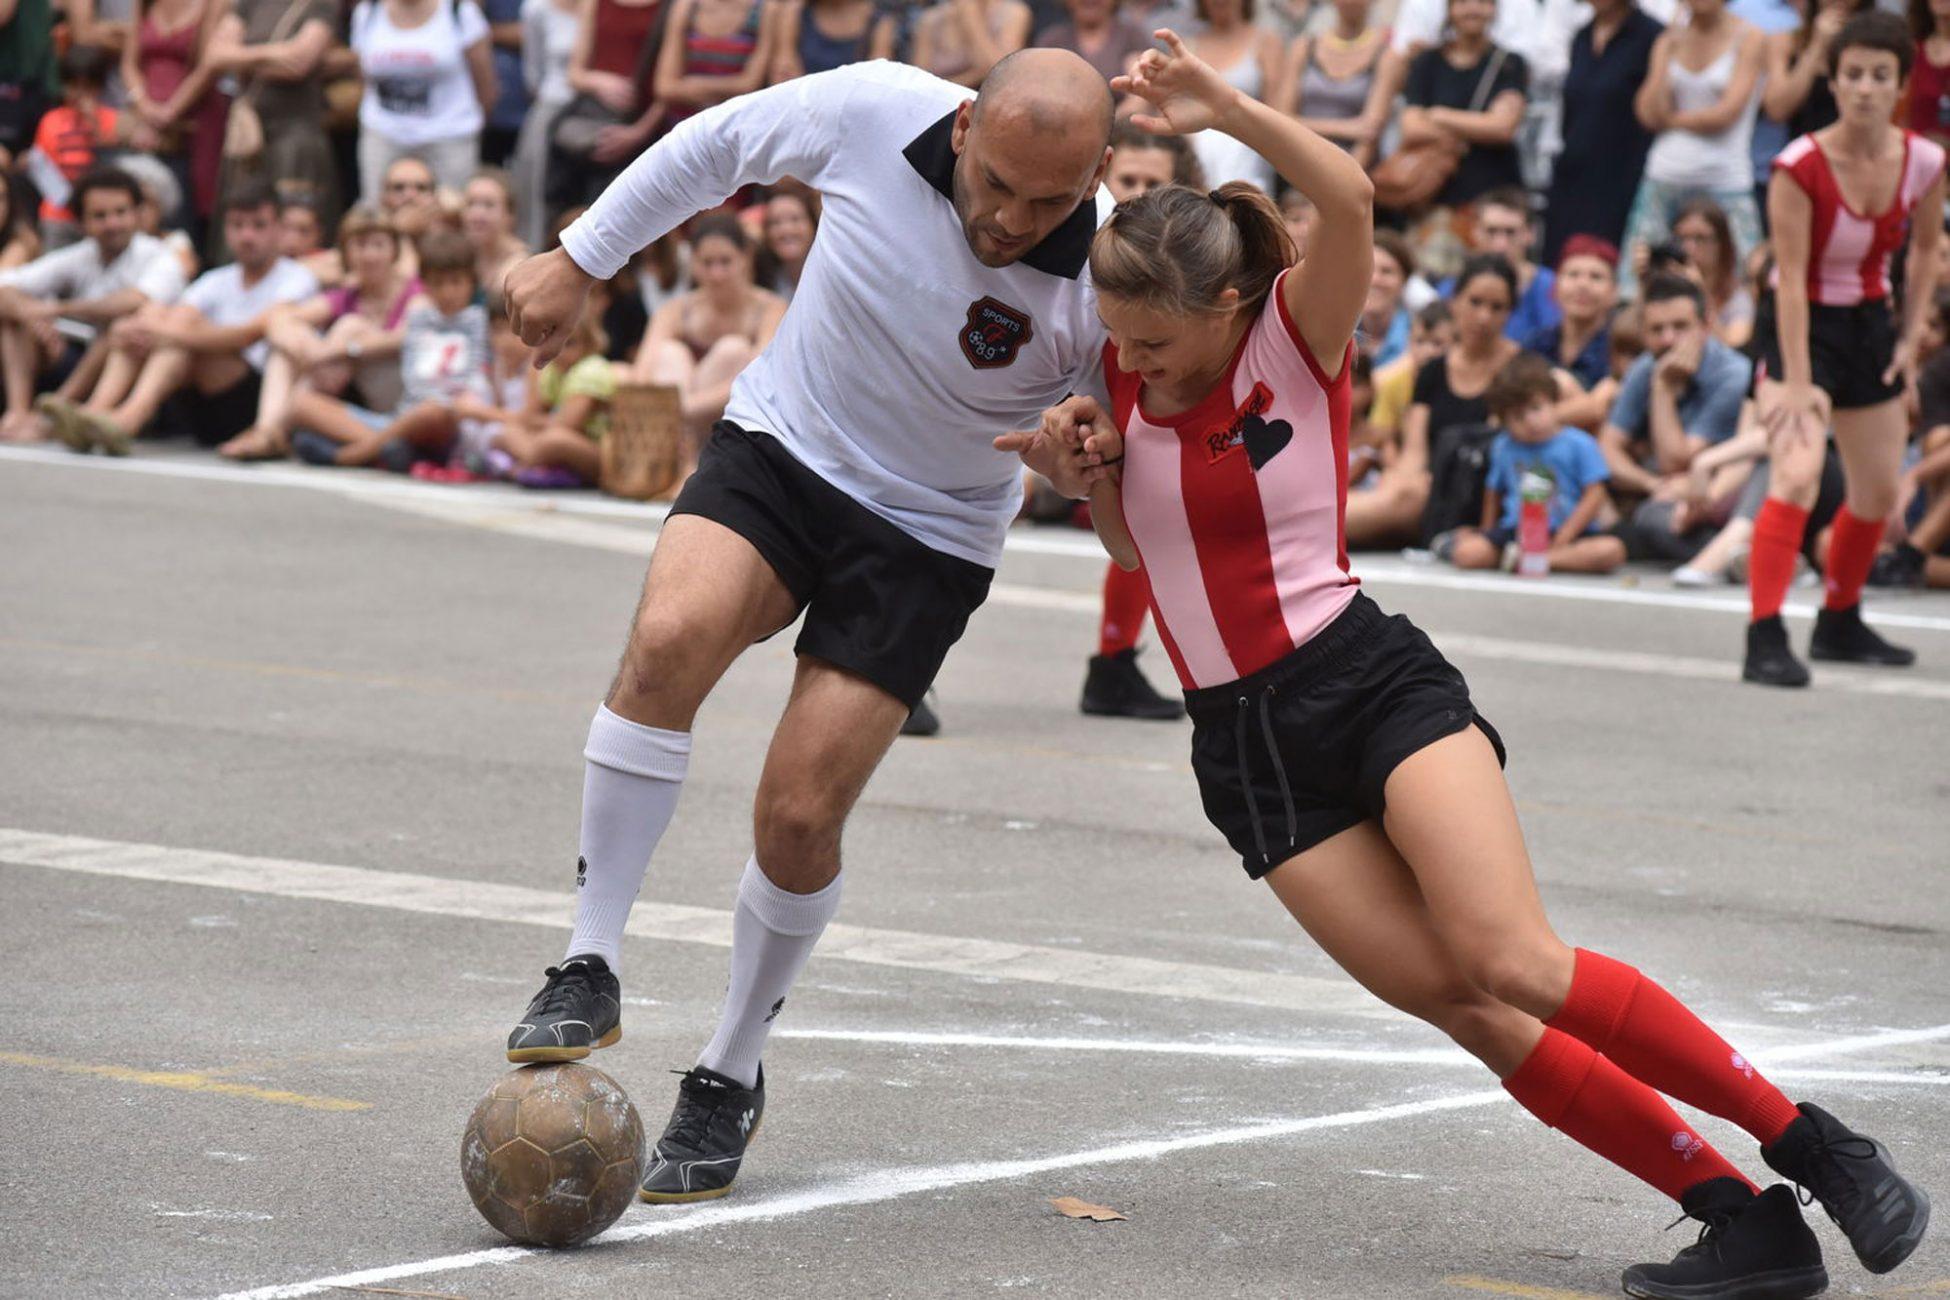 Footballer and dancer in Vero Cendoya's La Partida